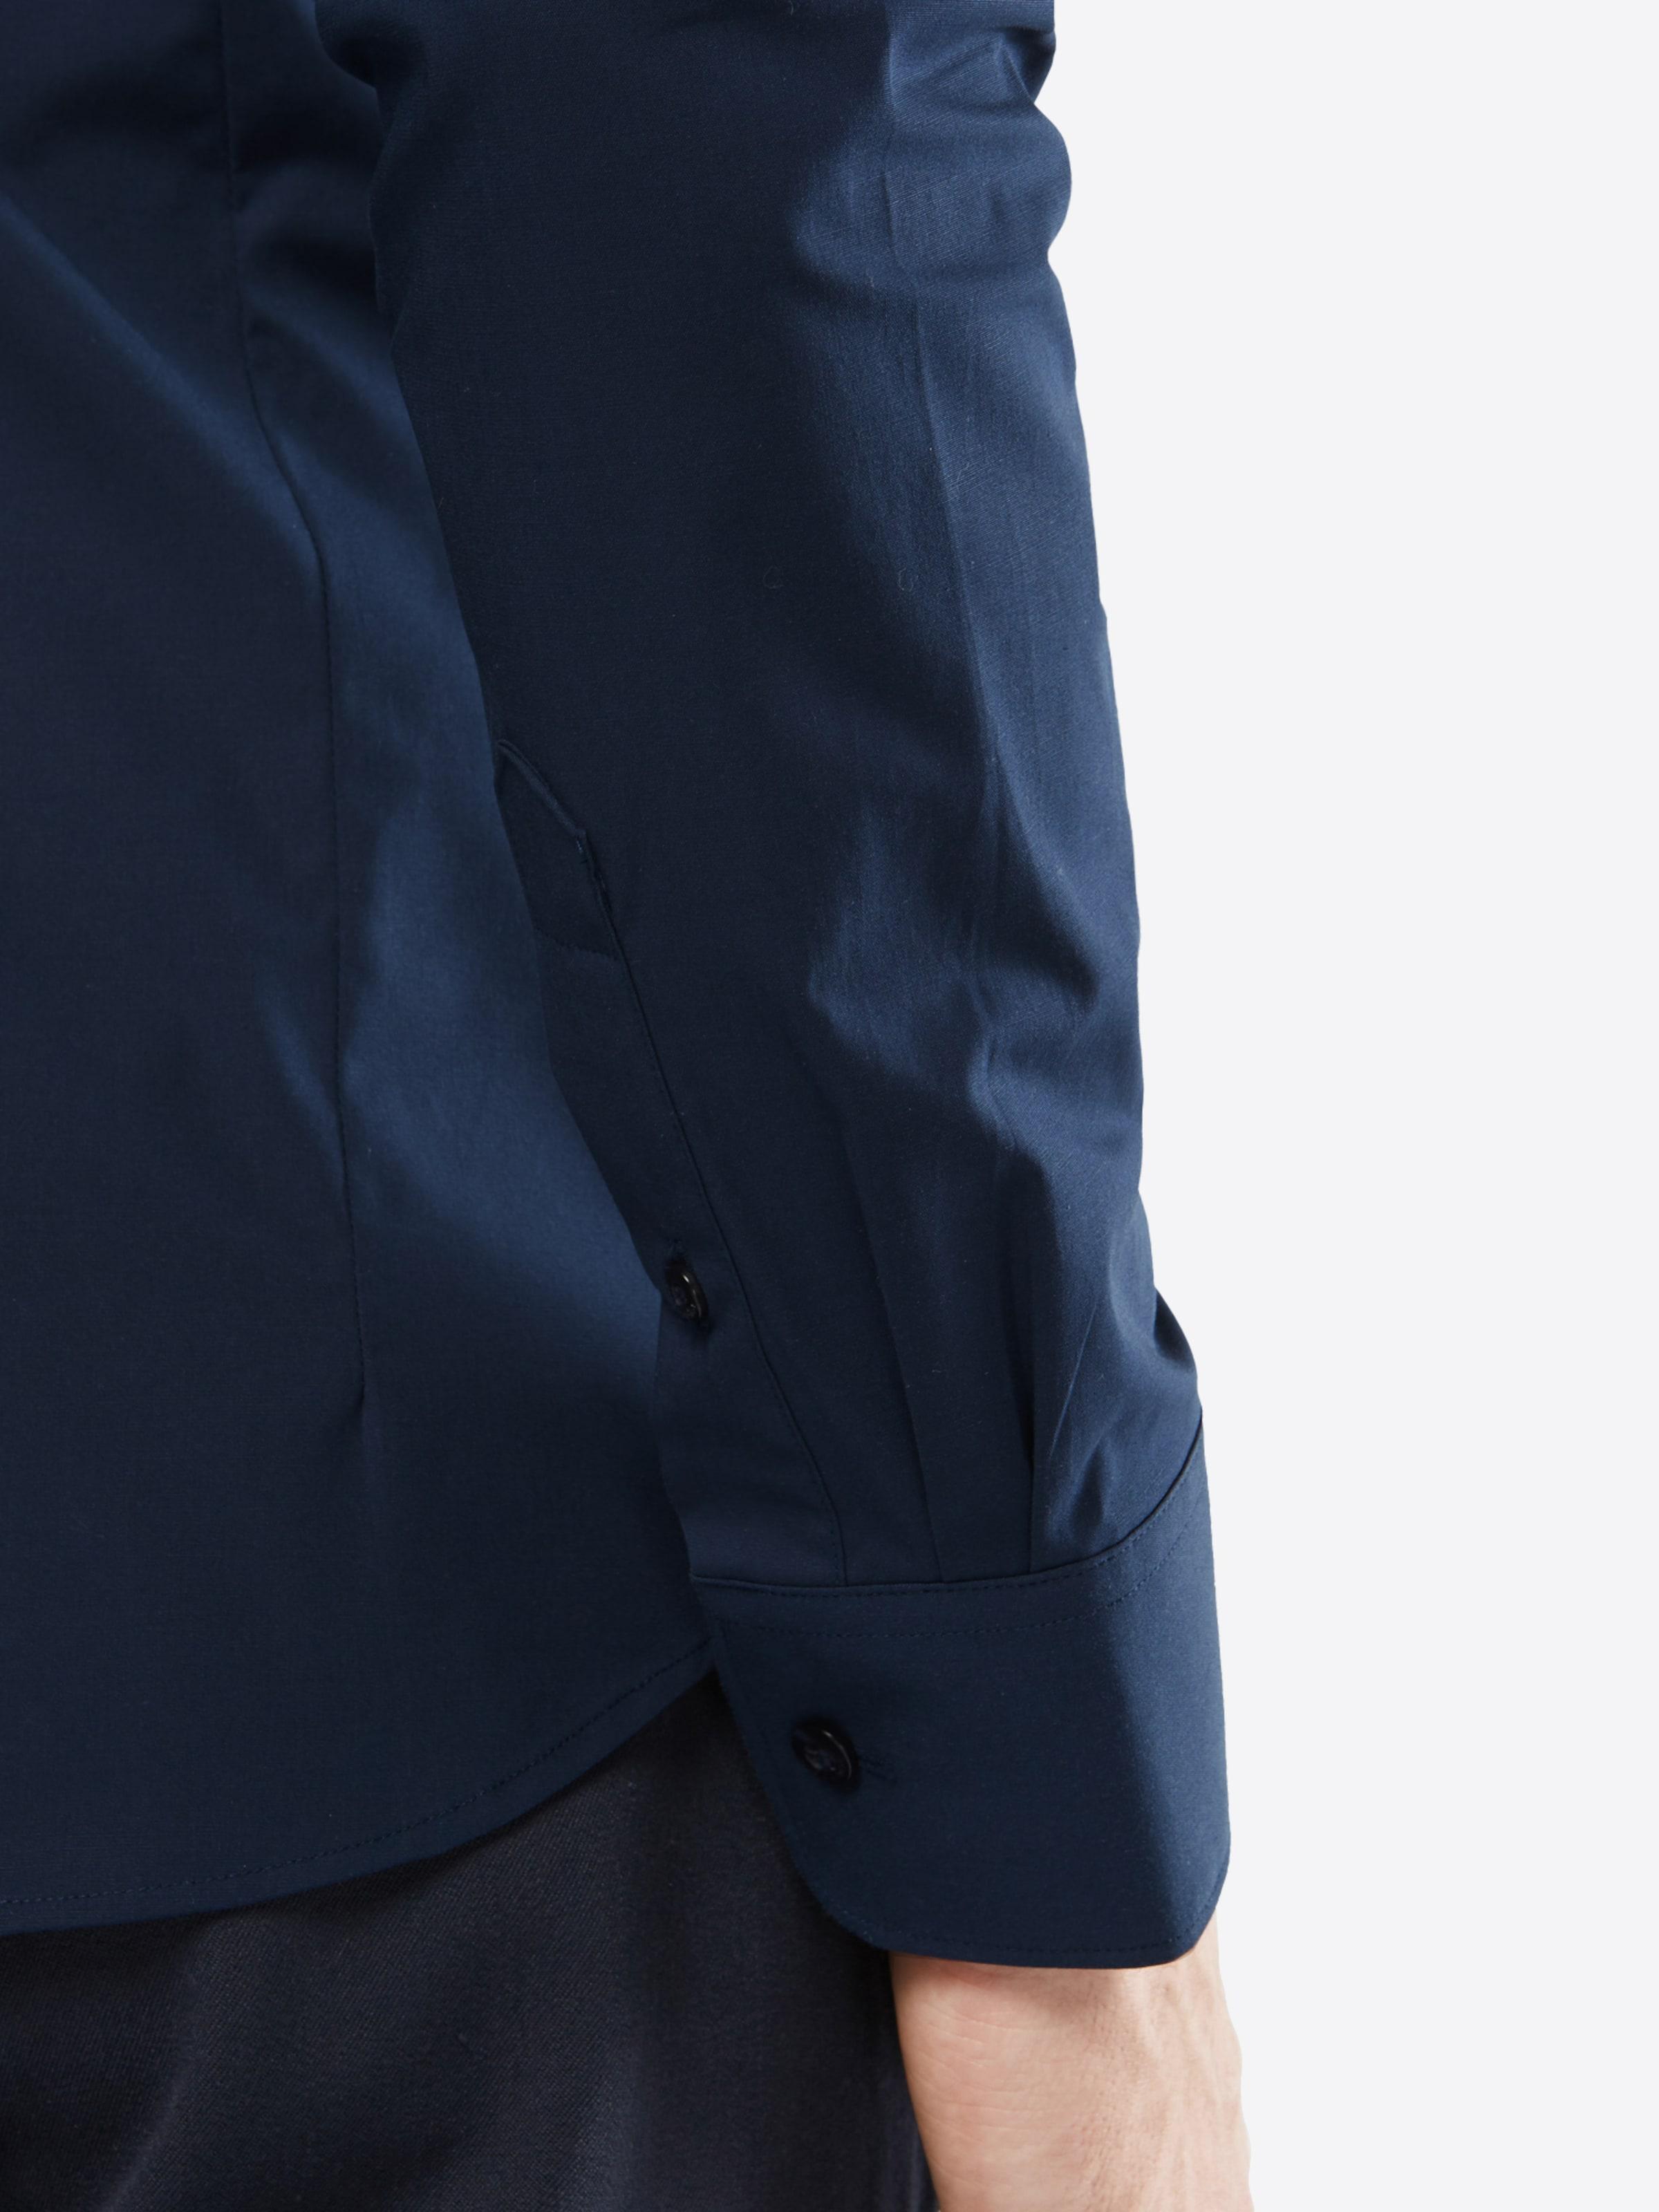 SCOTCH & SODA Hemd 'NOS - Classic longsleeve shirt in crispy cotton/lycra qualit' Für Billig Günstig Online Olht8HWzUf